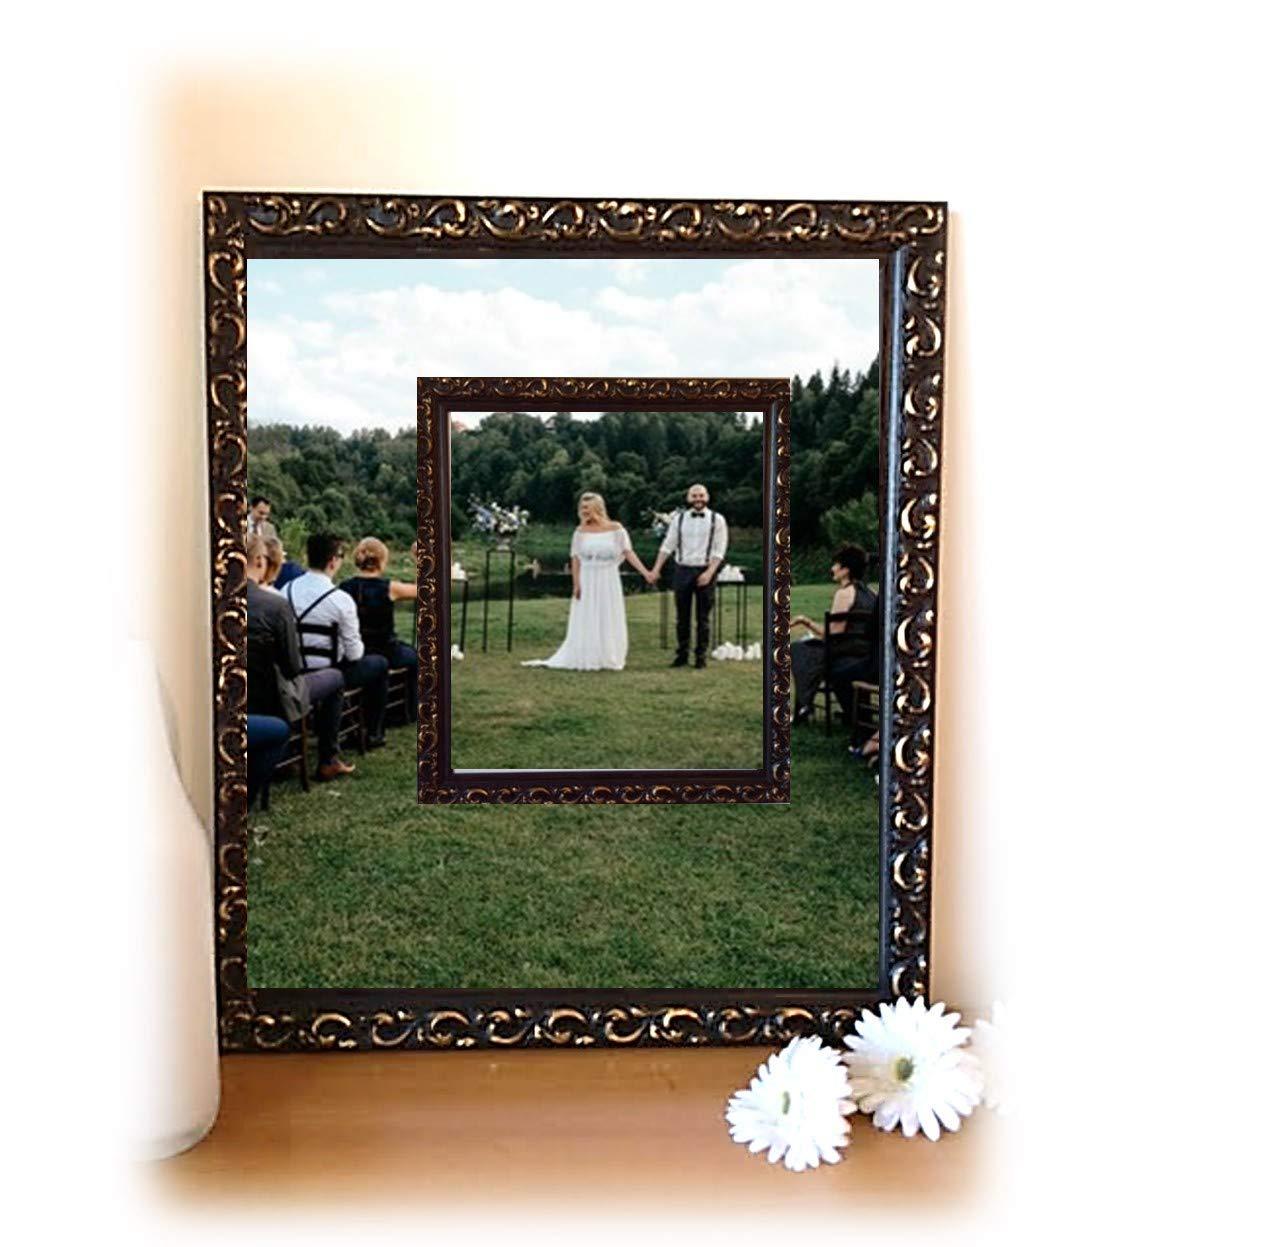 Marco decorativo para bodas. Estilo rústico. Photocall de bodas.: Amazon.es: Handmade